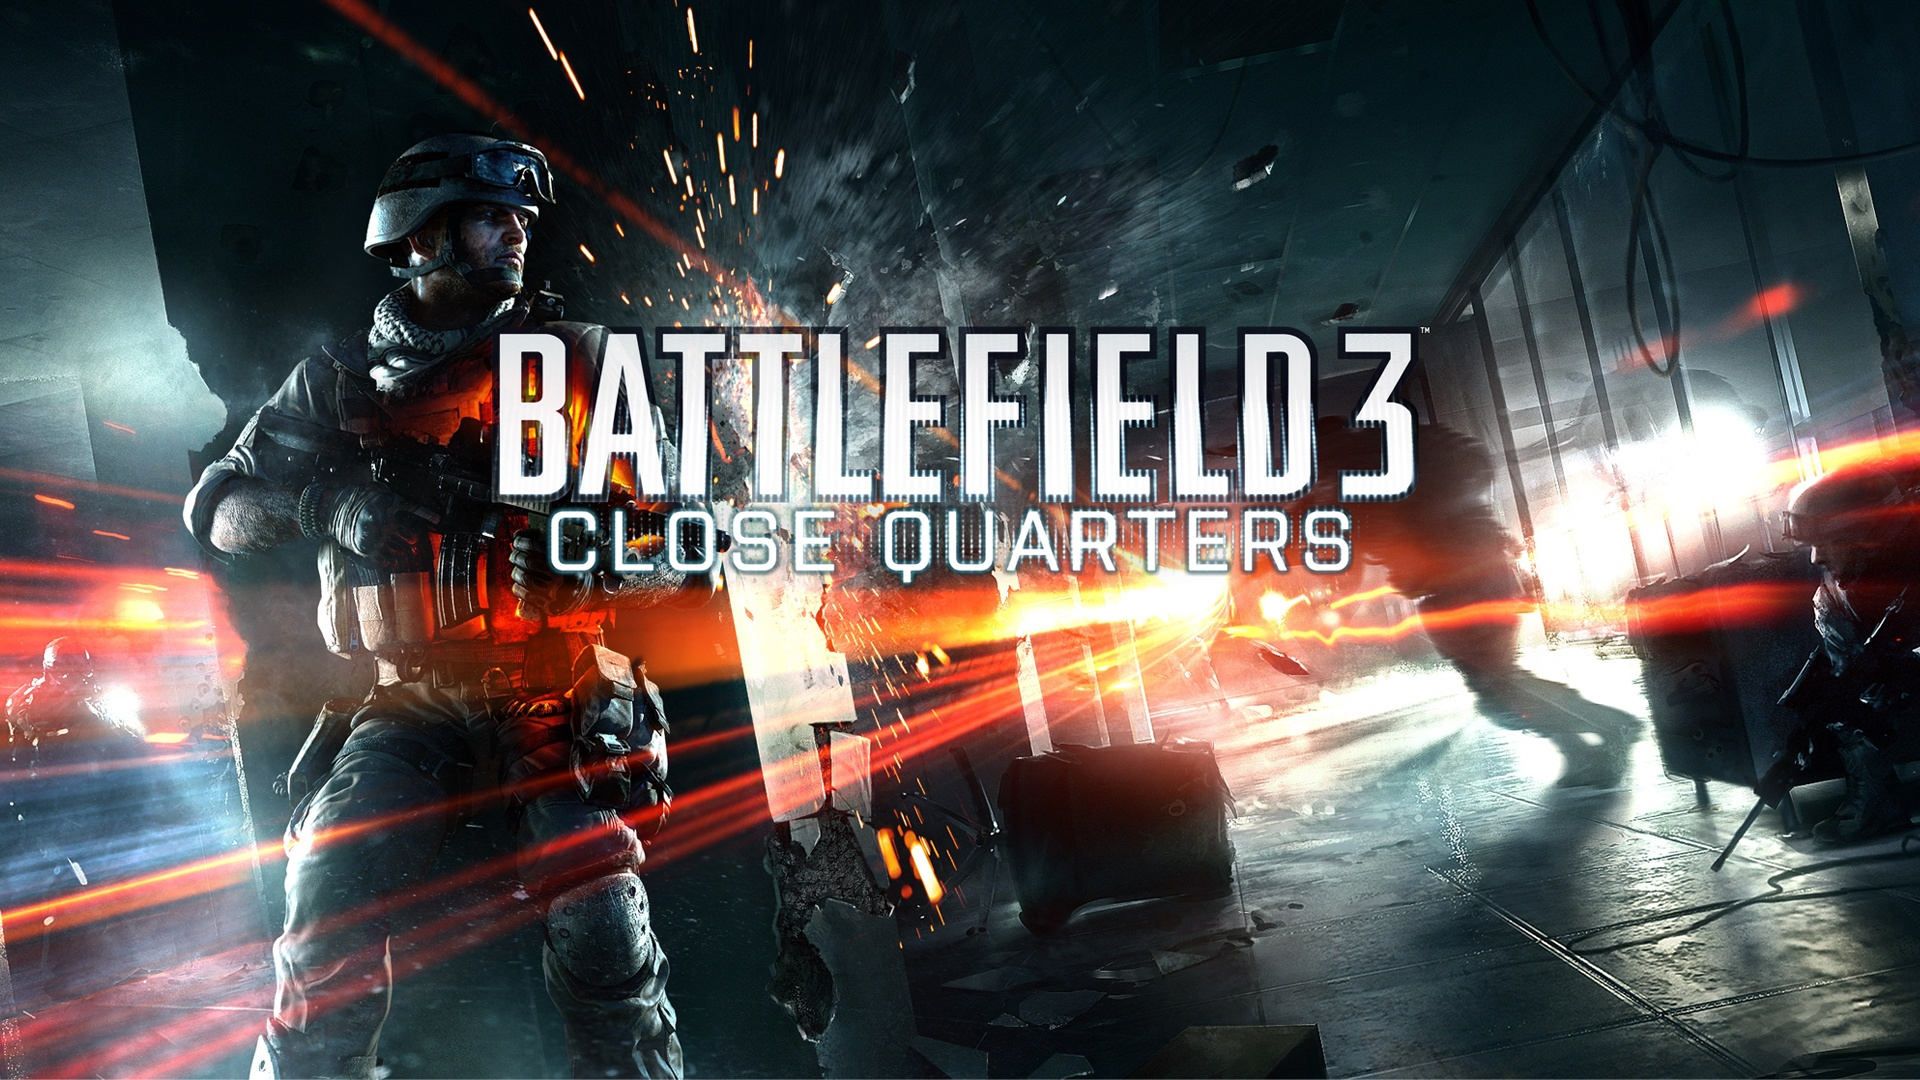 Battlefield 3 - Close Quarters Wallpapers 001